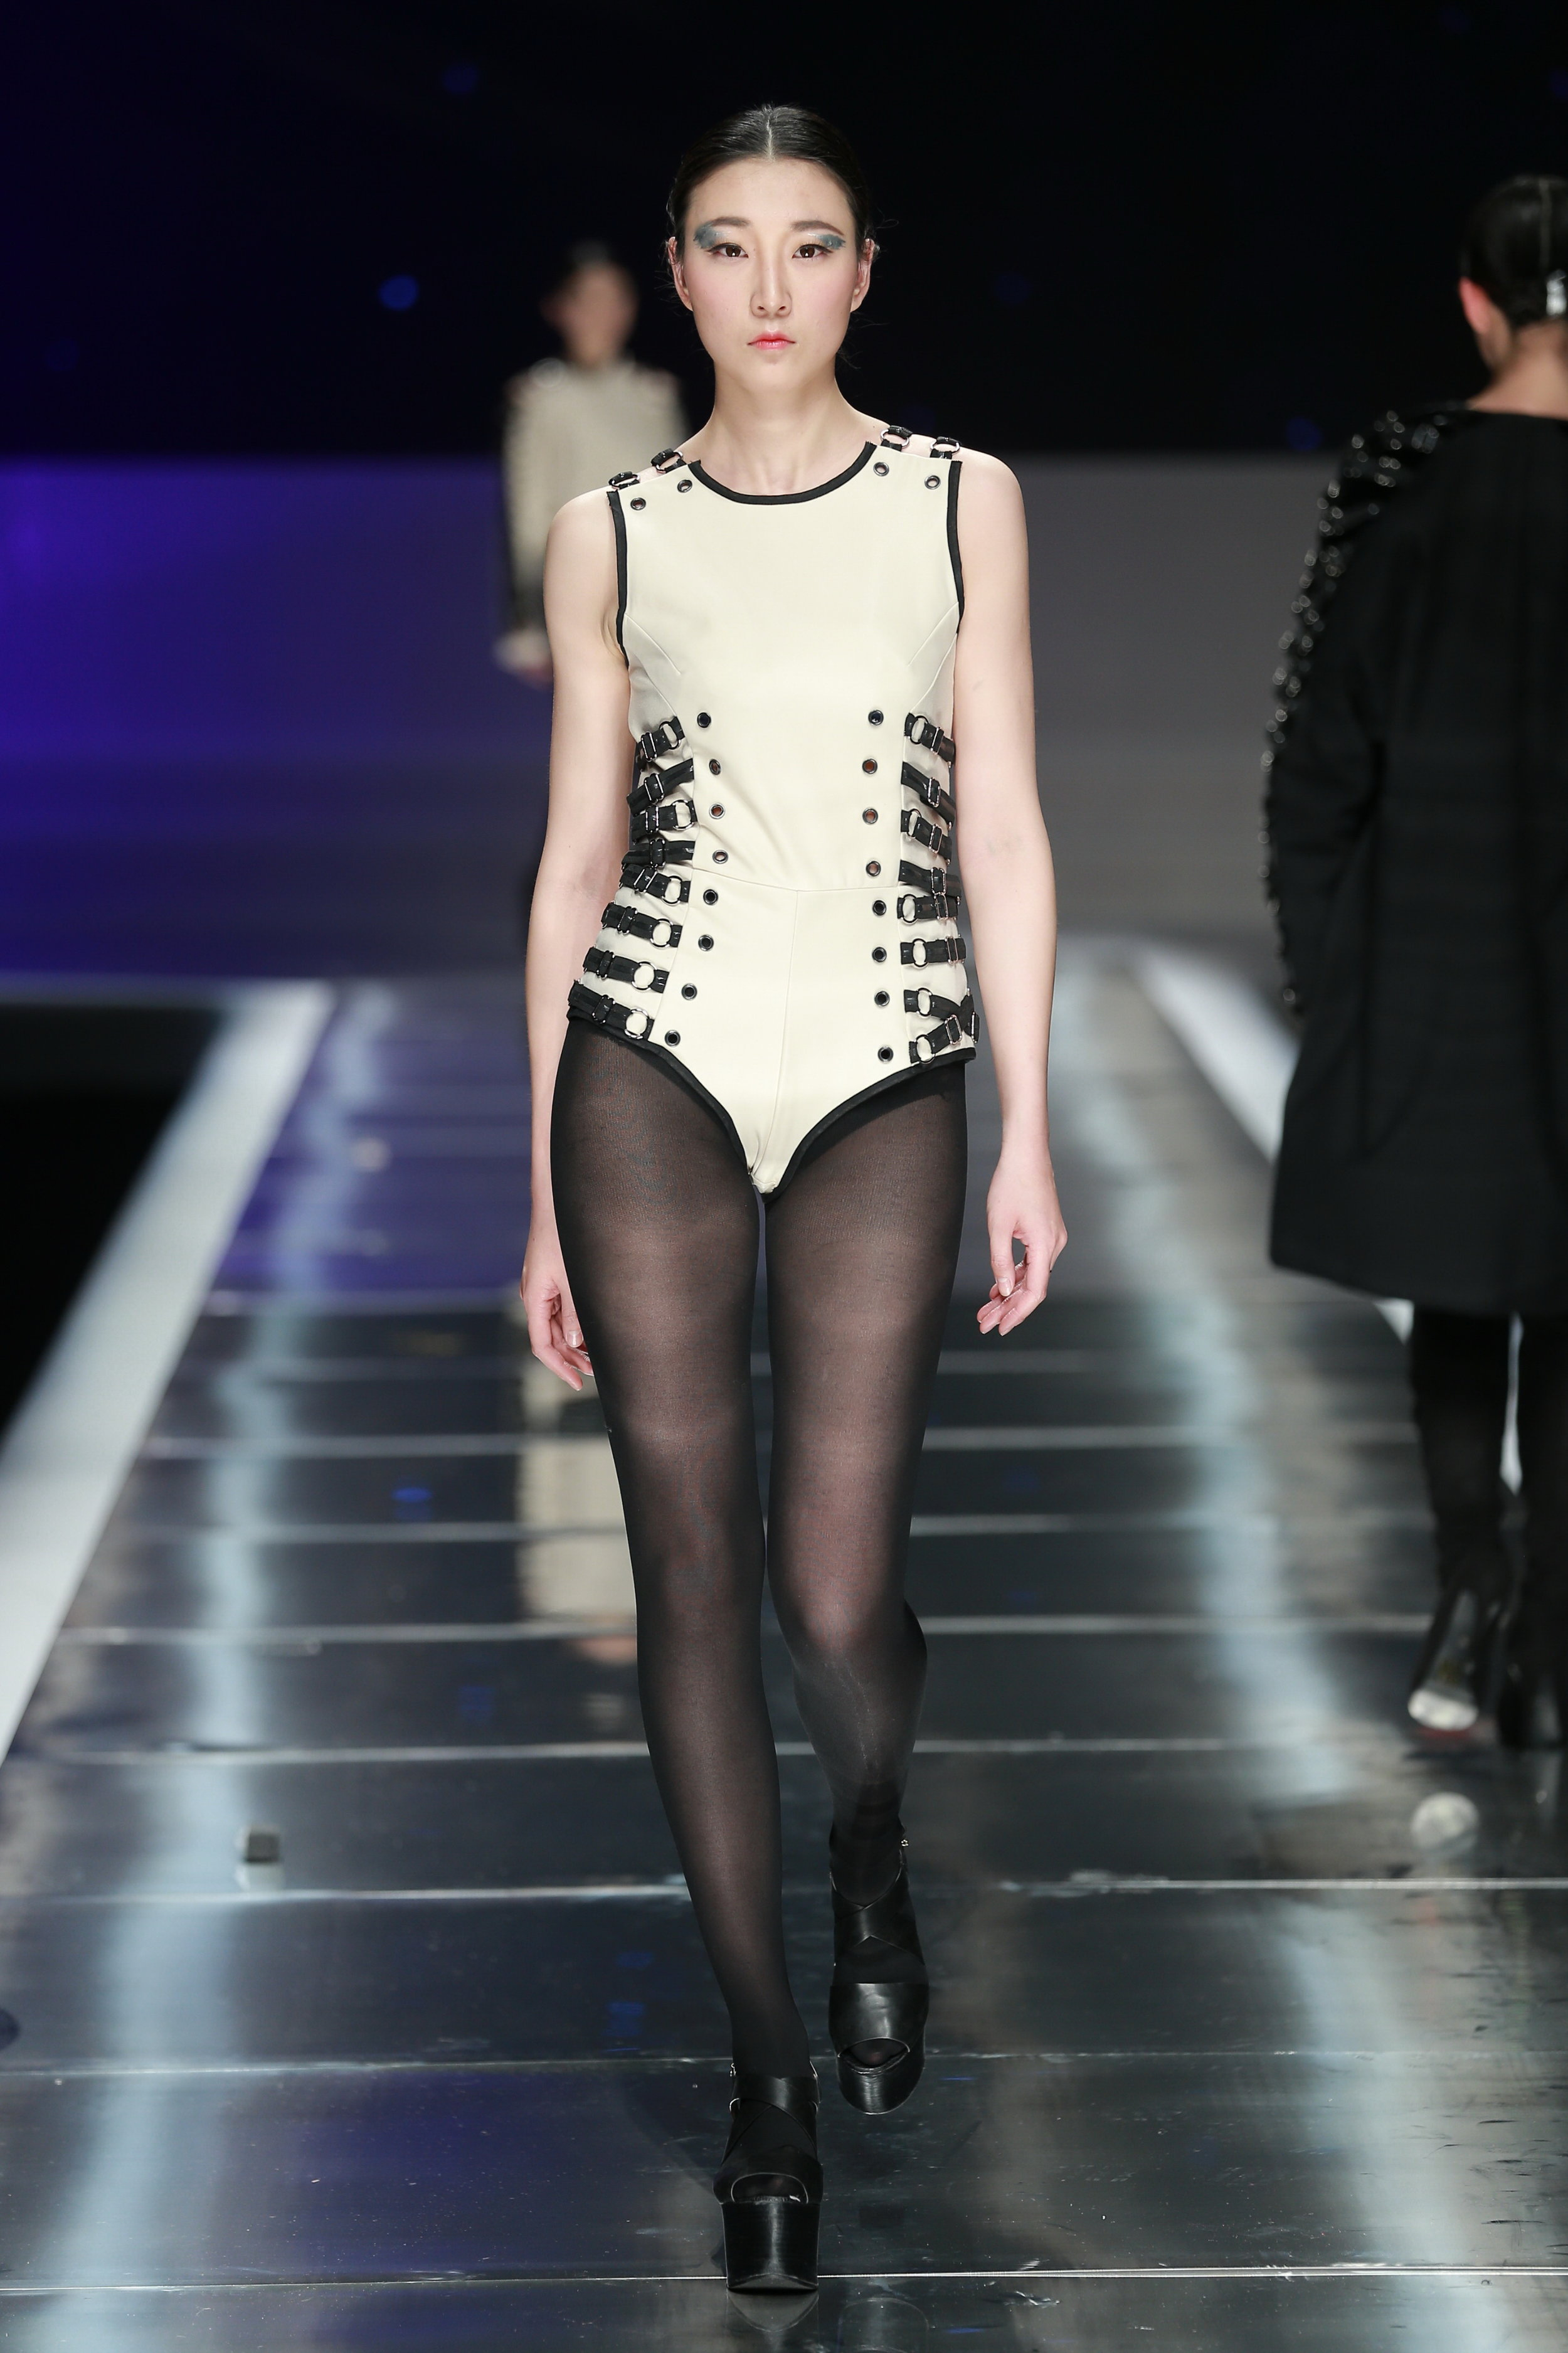 China-Look2-Overall-Award-Fashion-Week-Show.JPG